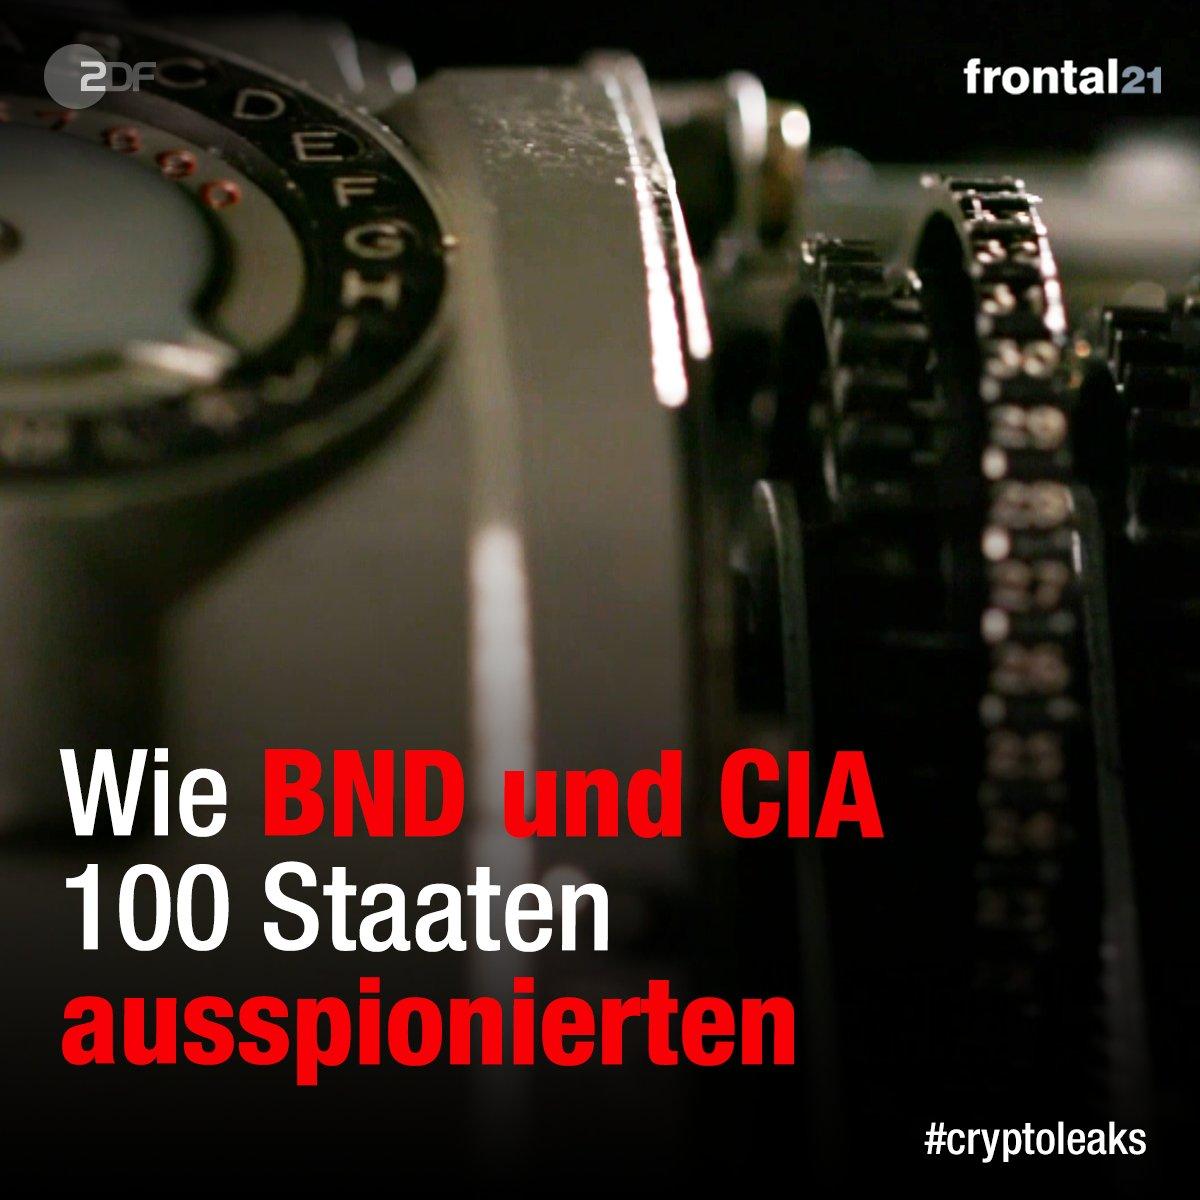 BND und CIA